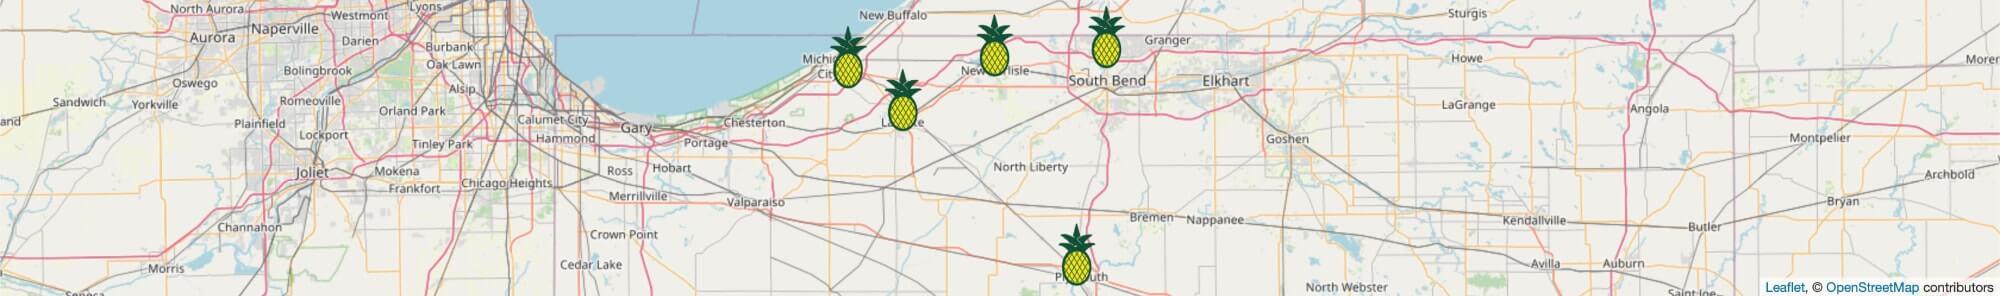 Locations of Michiana Insurance Desktop Map